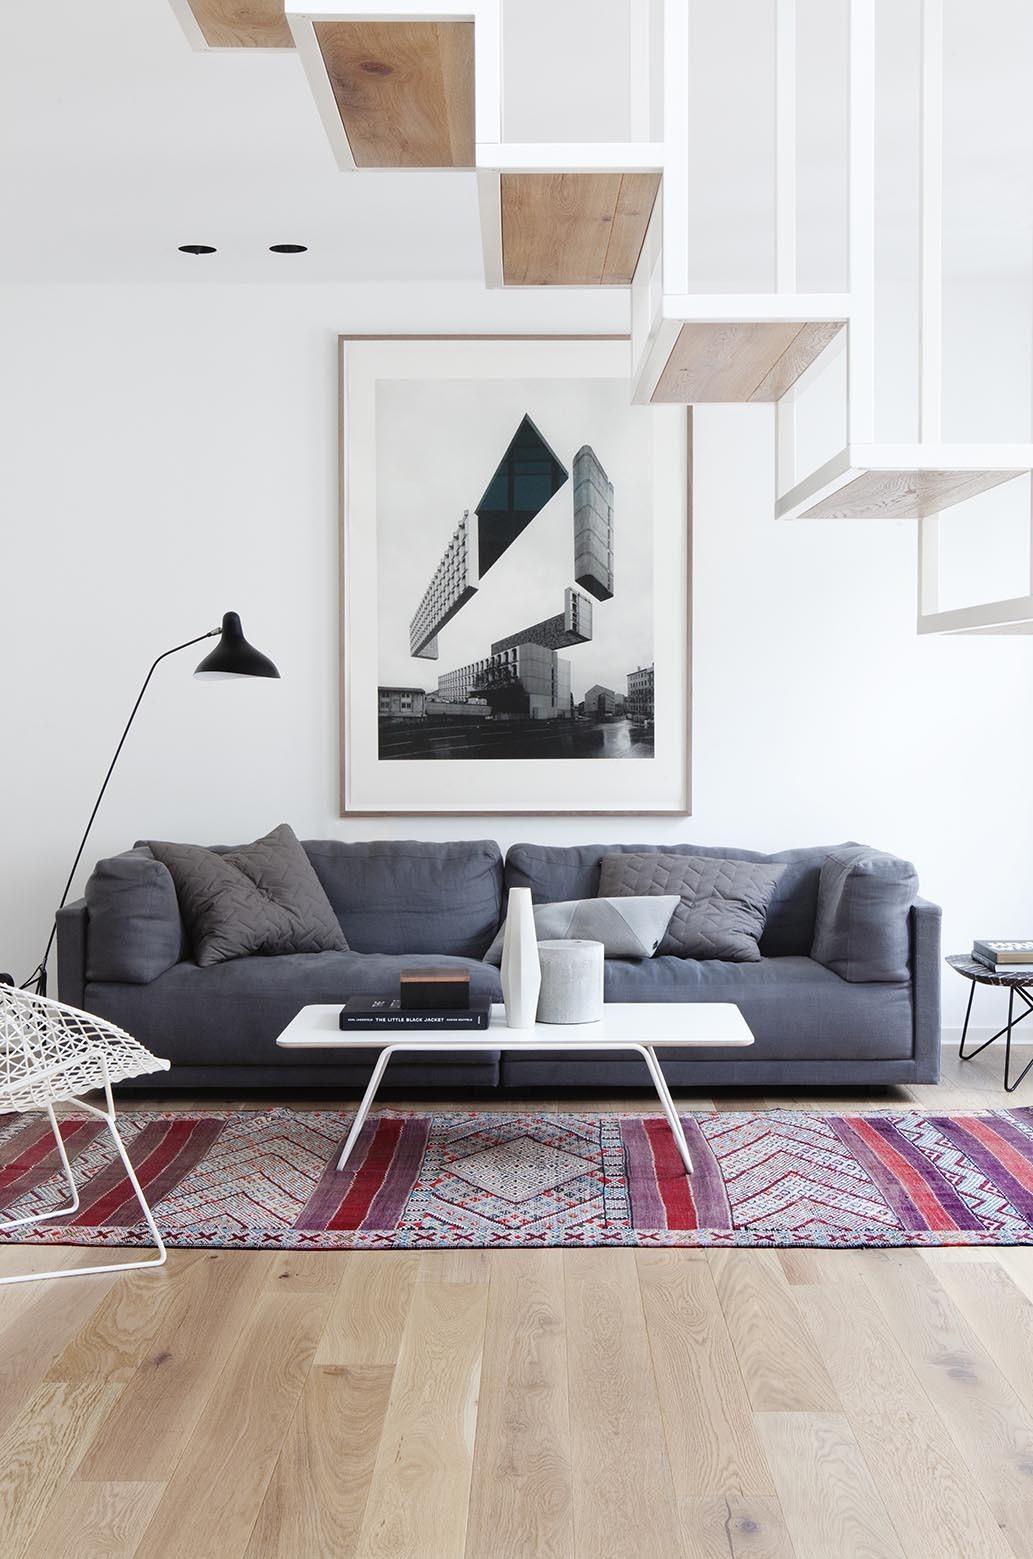 Gallery of Idunsgate / Haptic Architects - 9